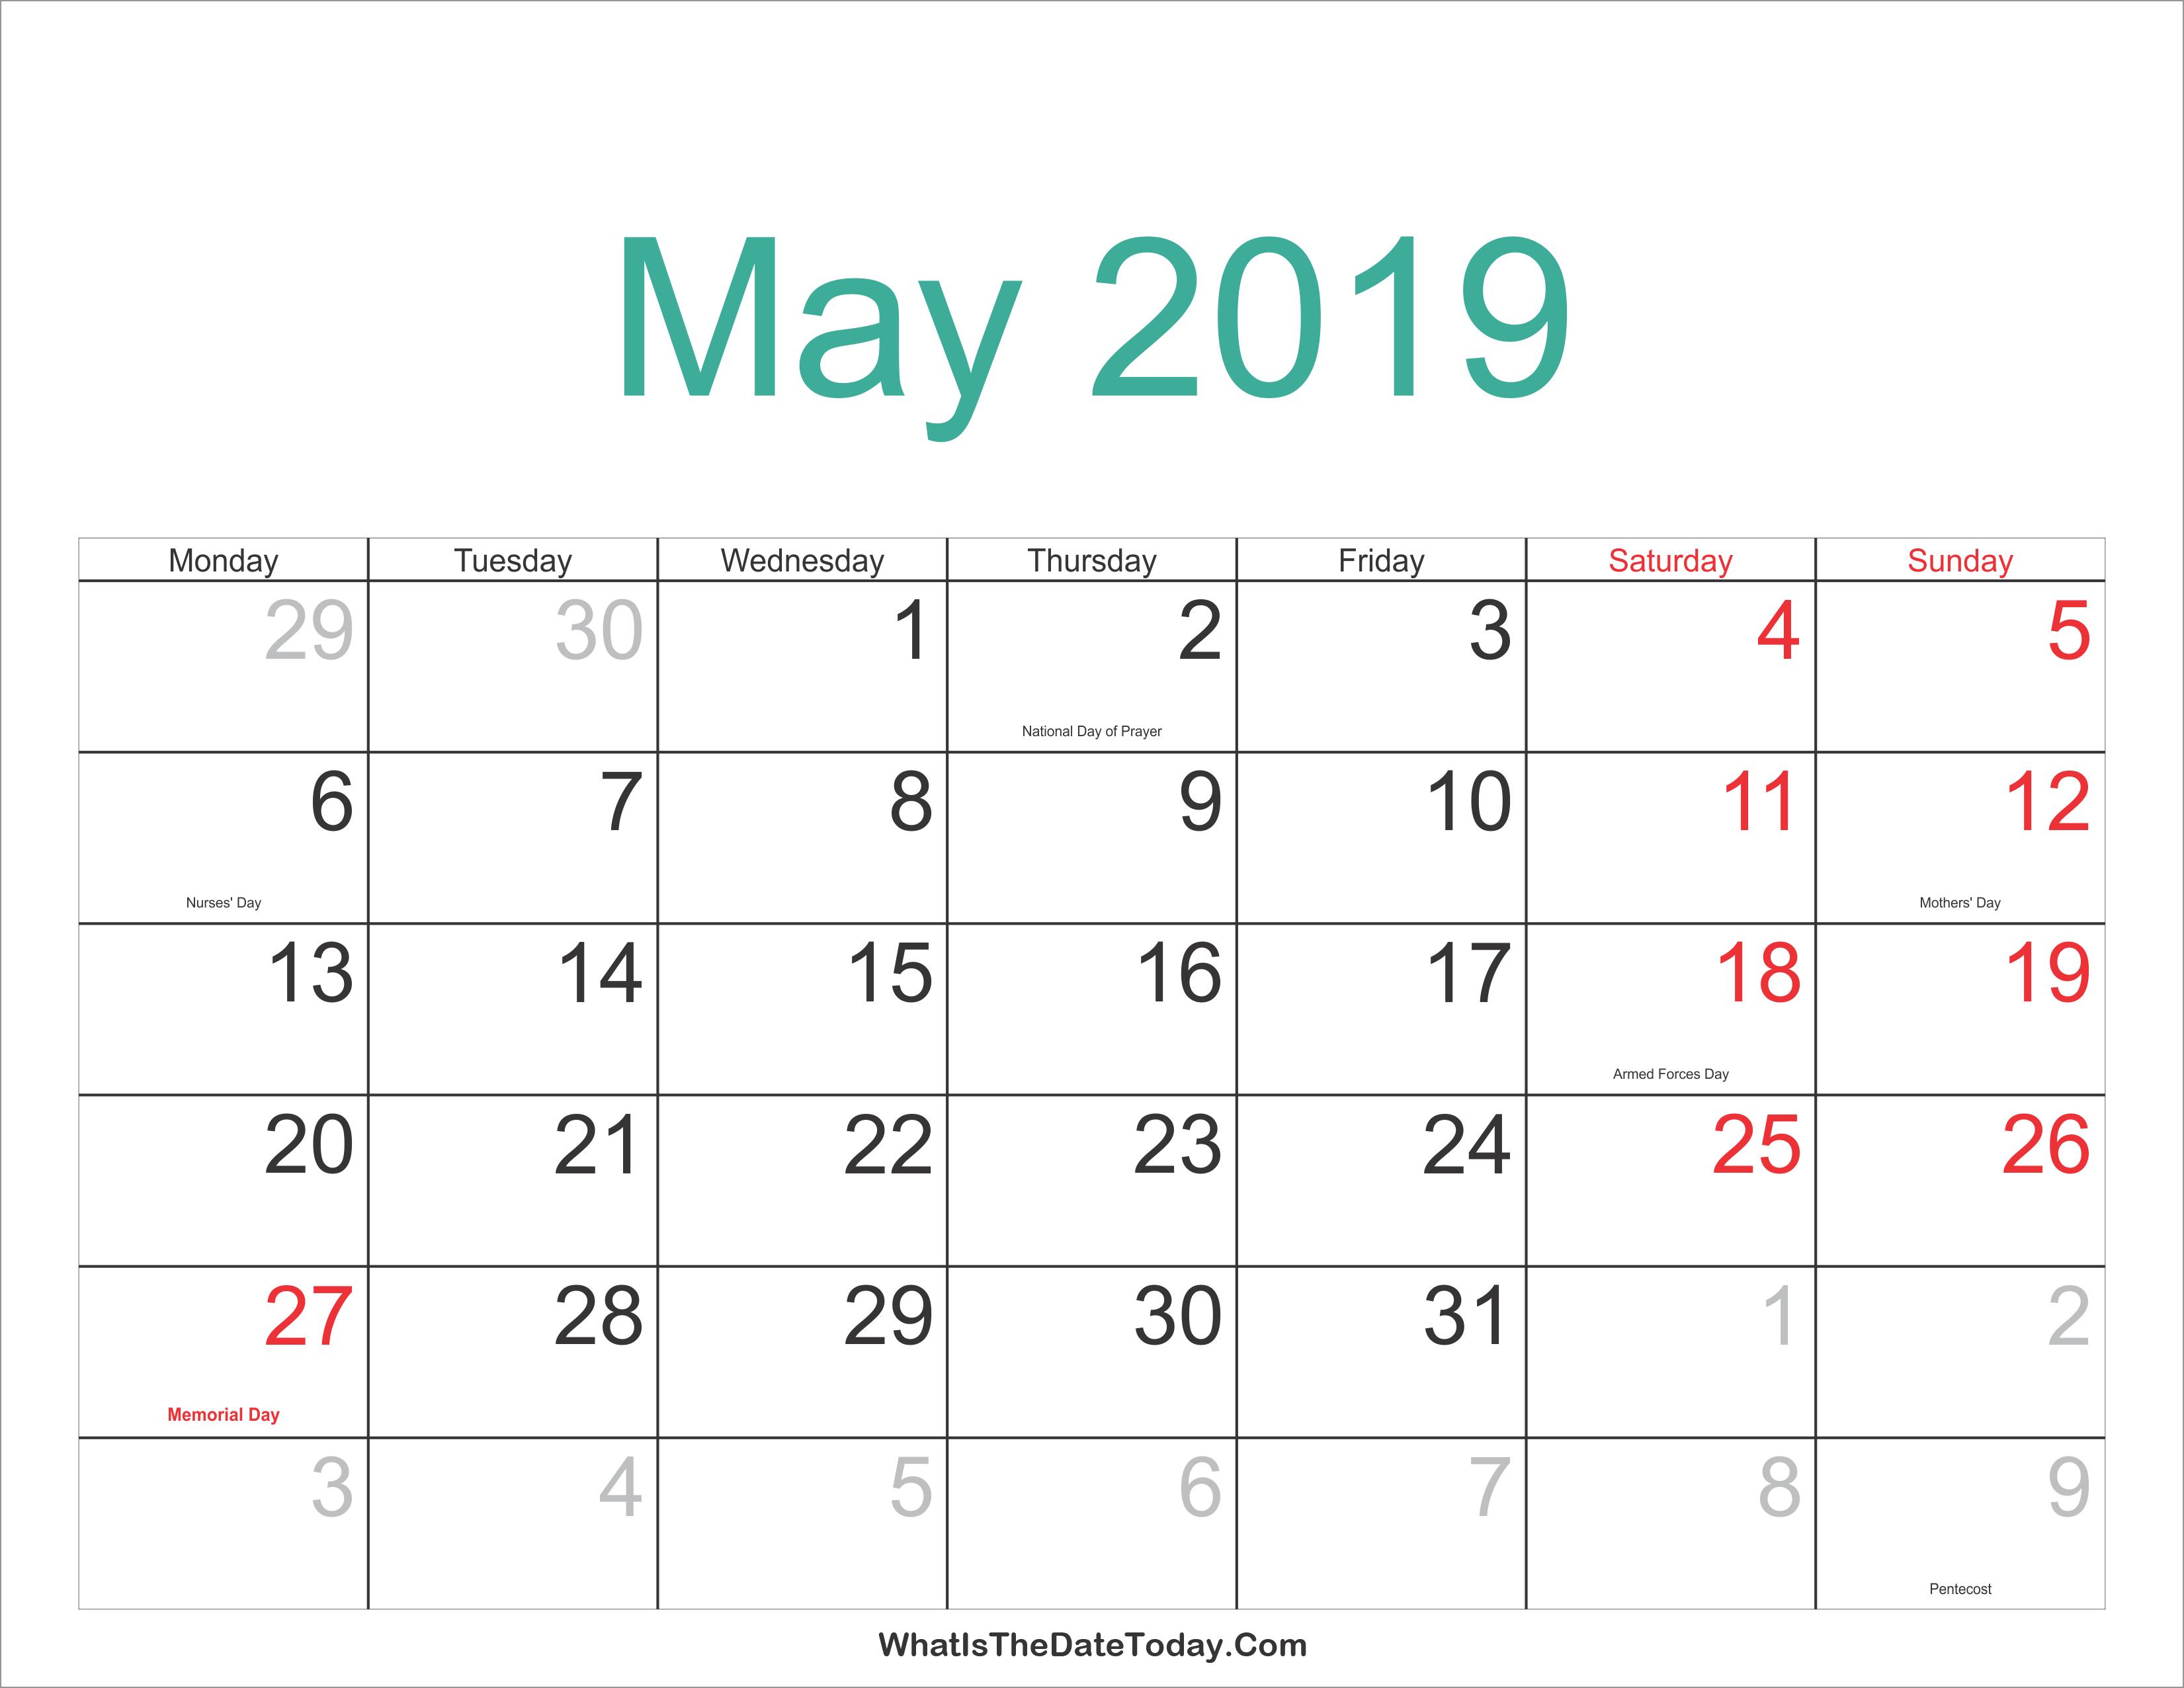 May 2019 Calendar With Holidays - Free Printable Calendar, Templates May 2 2019 Calendar